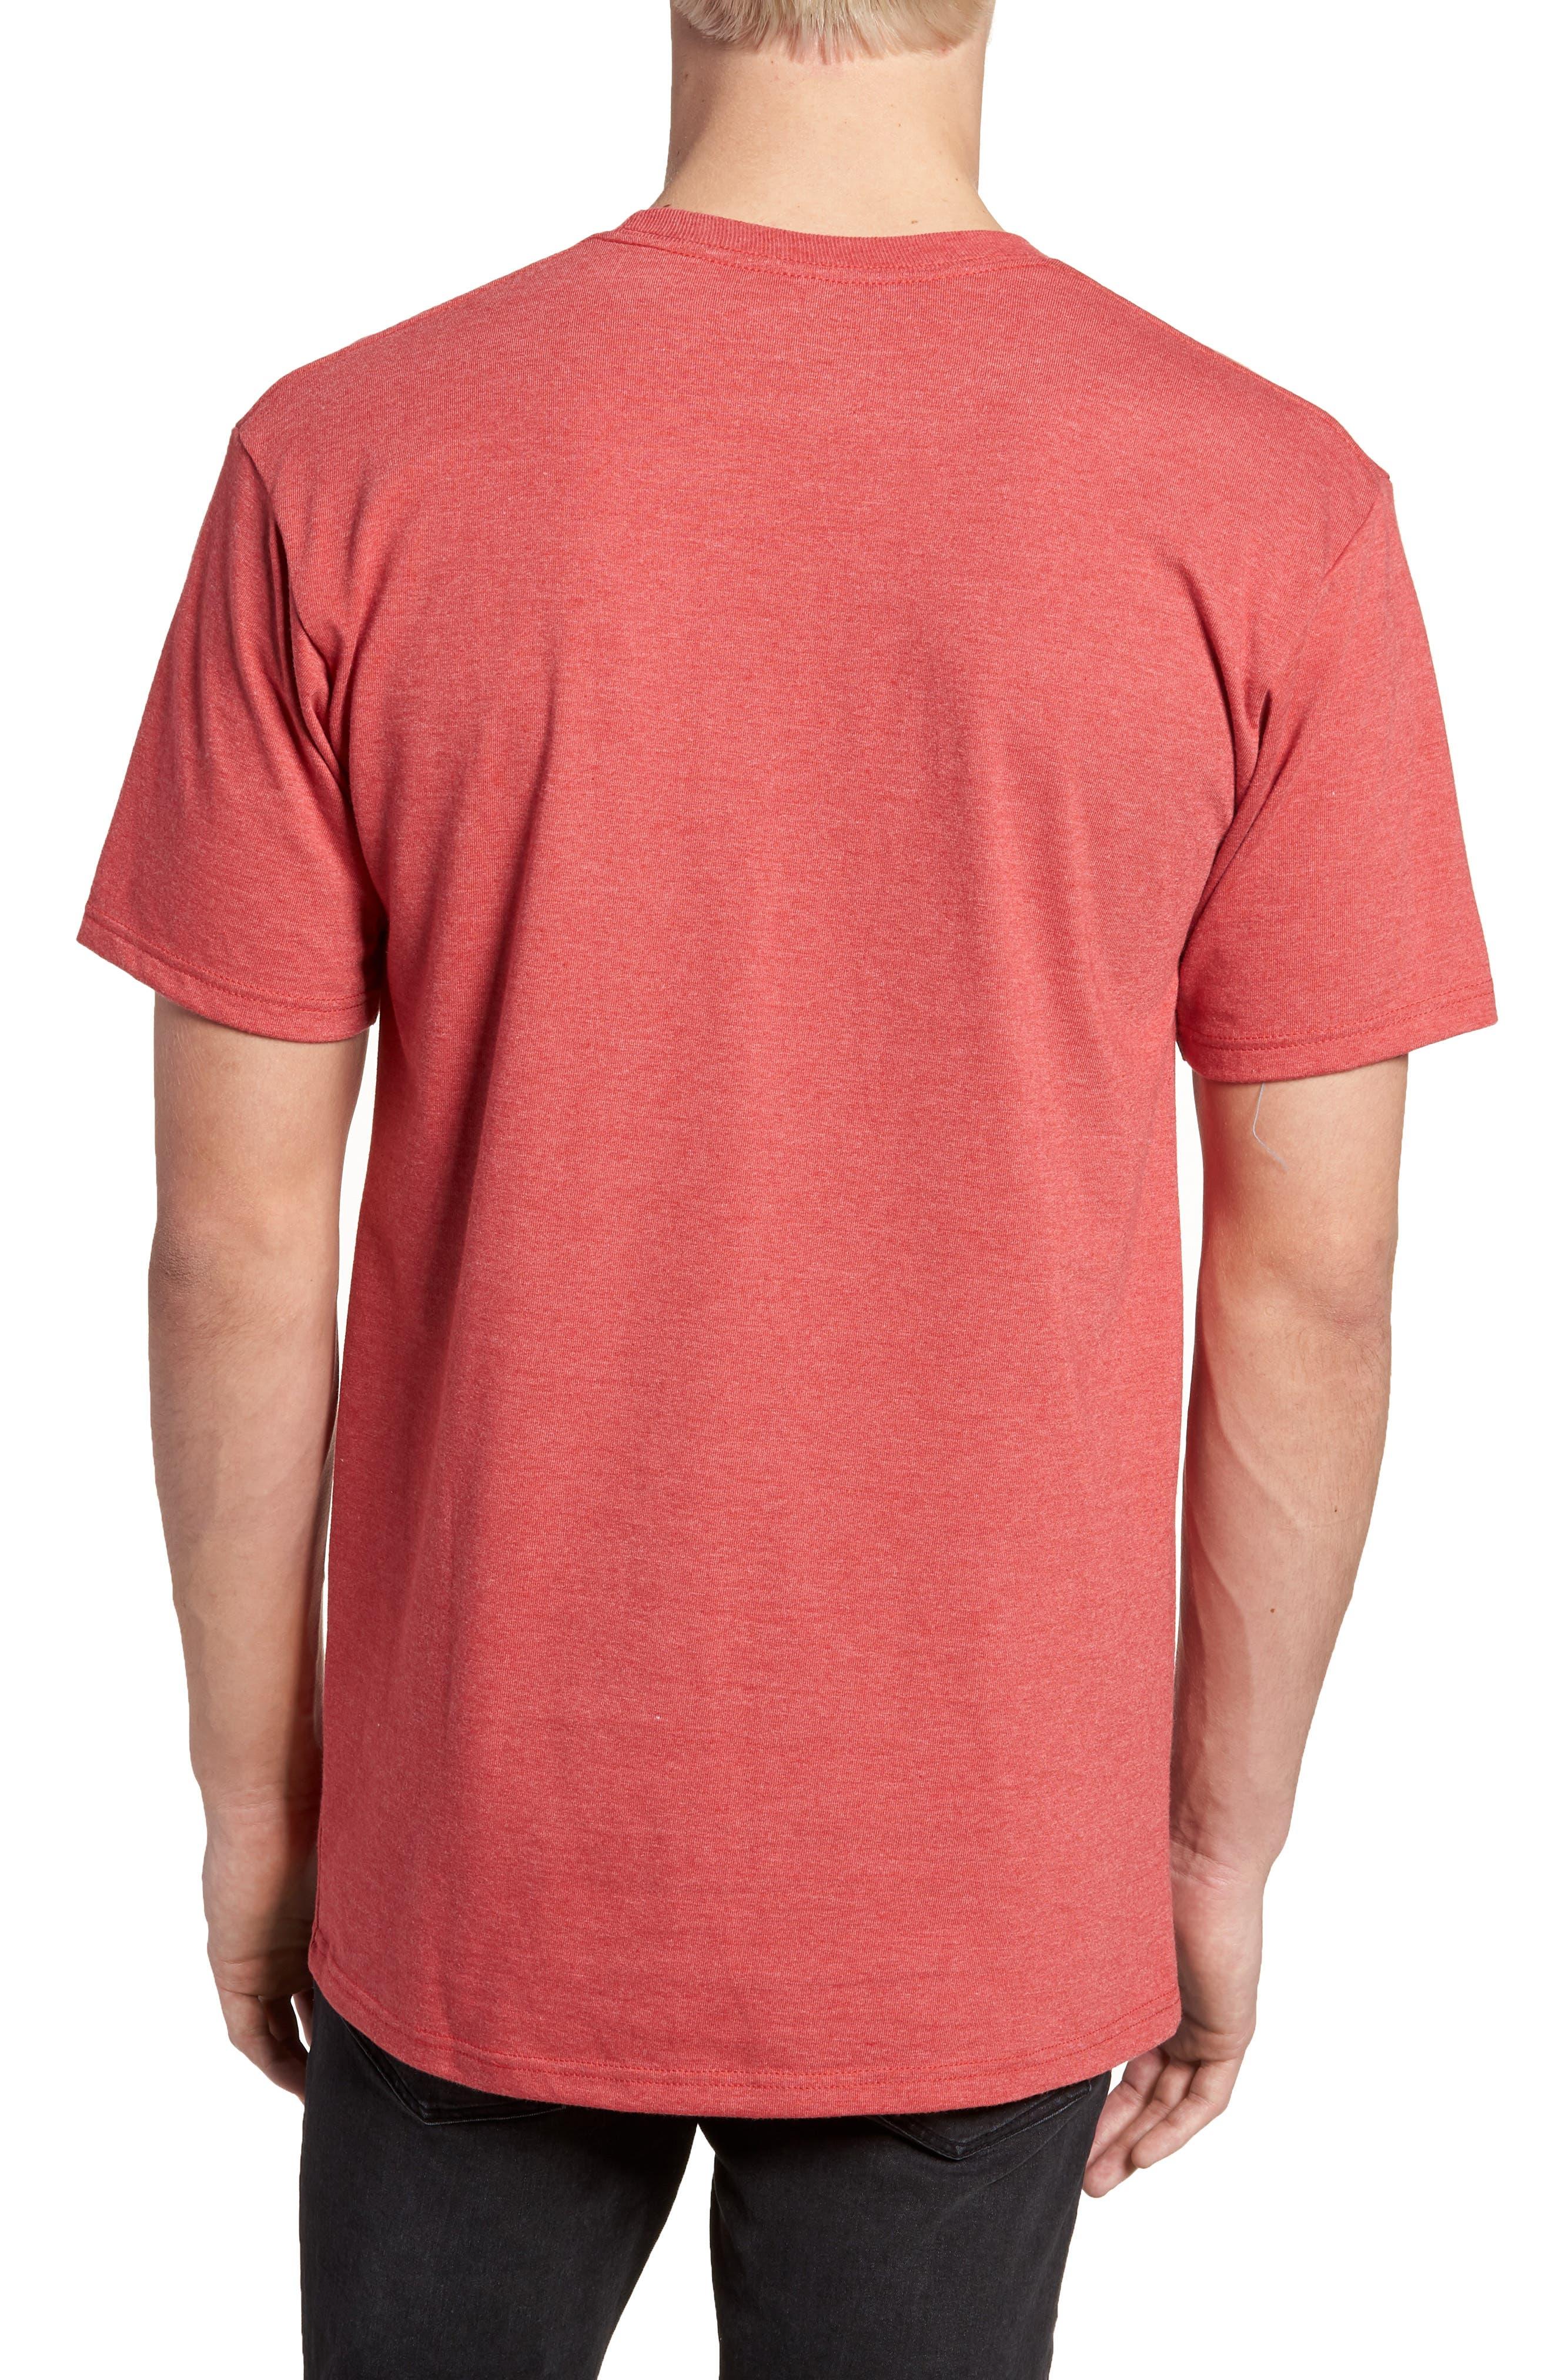 MFG Graphic T-Shirt,                             Alternate thumbnail 2, color,                             601